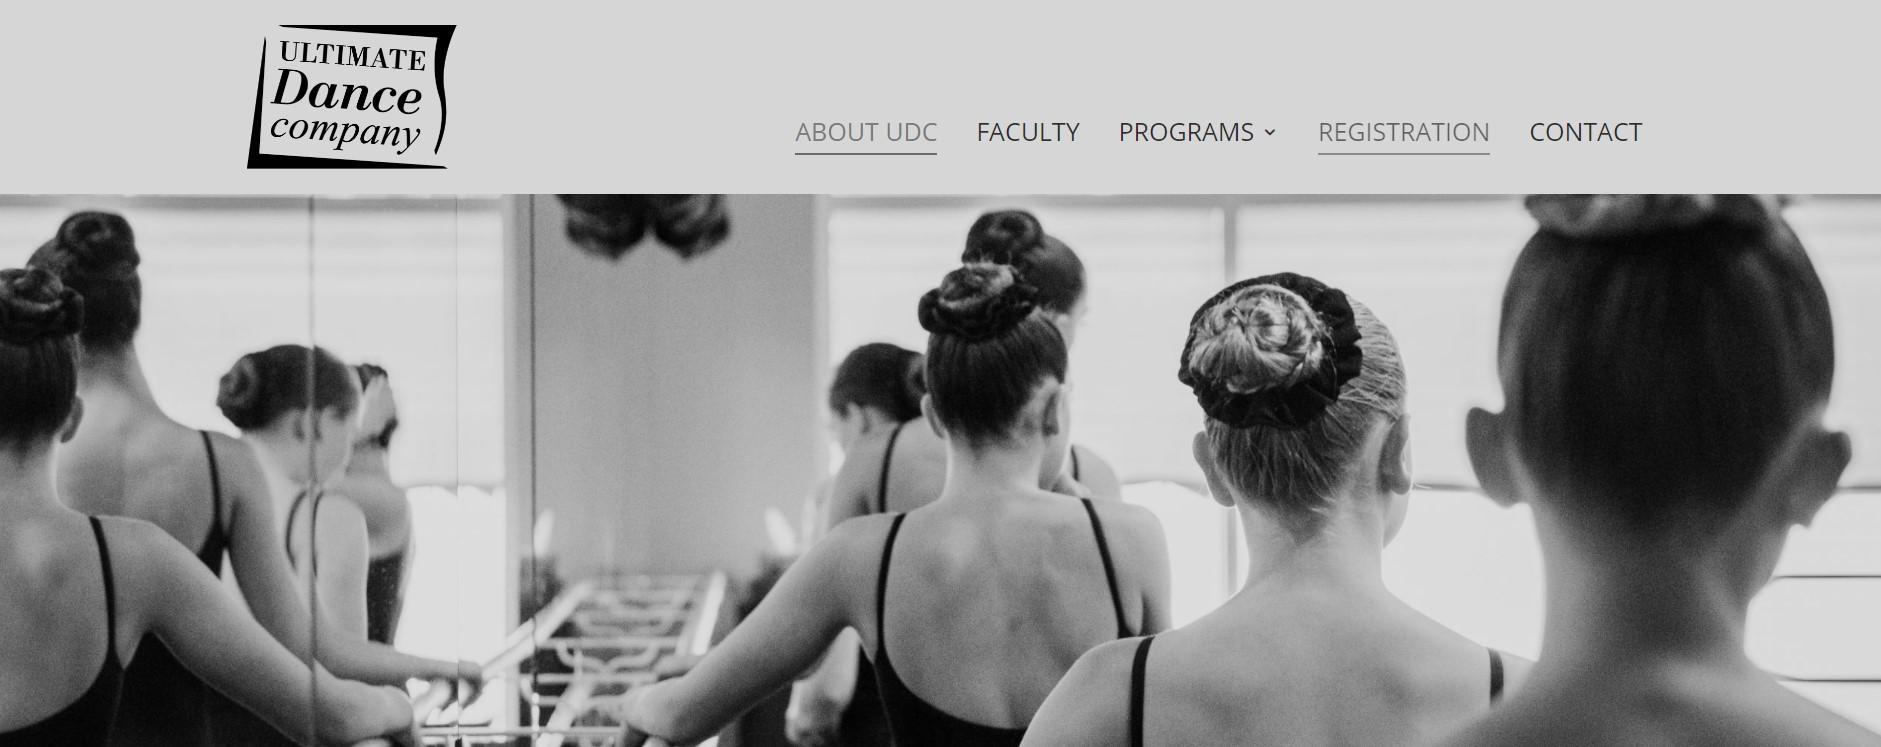 ultimate dance company dance instructor in calgary